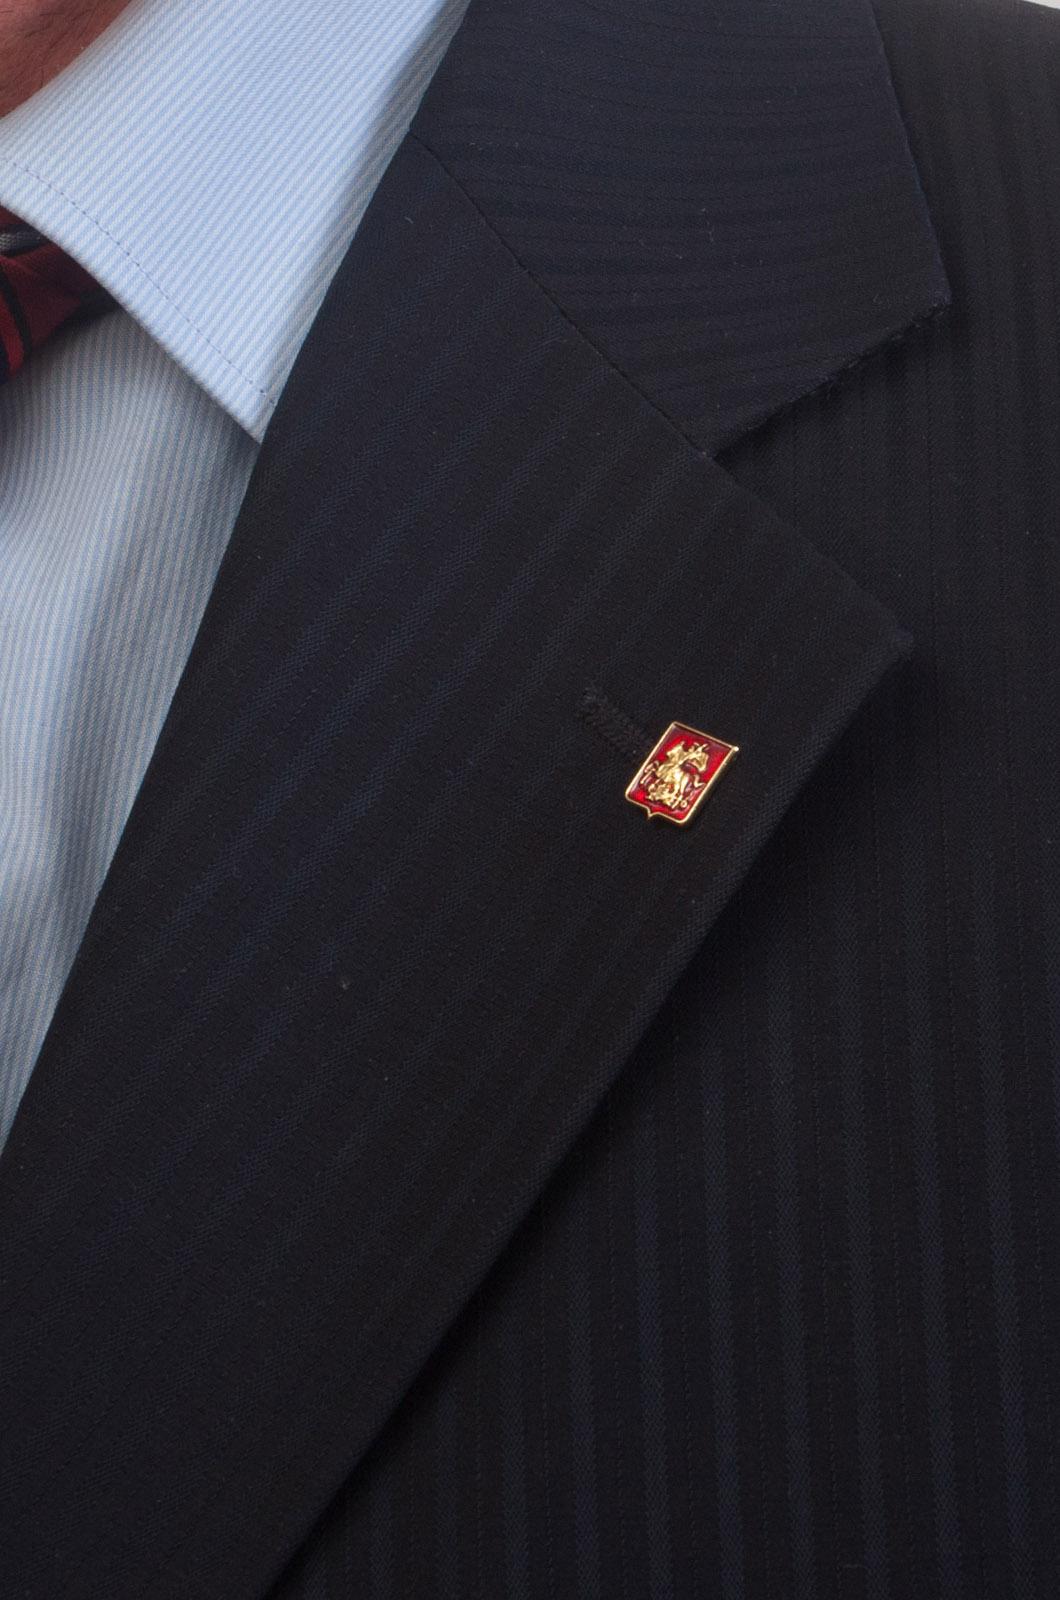 "Значок ""Москва"" на лацкан пиджака - вид на лацкане пиджака"